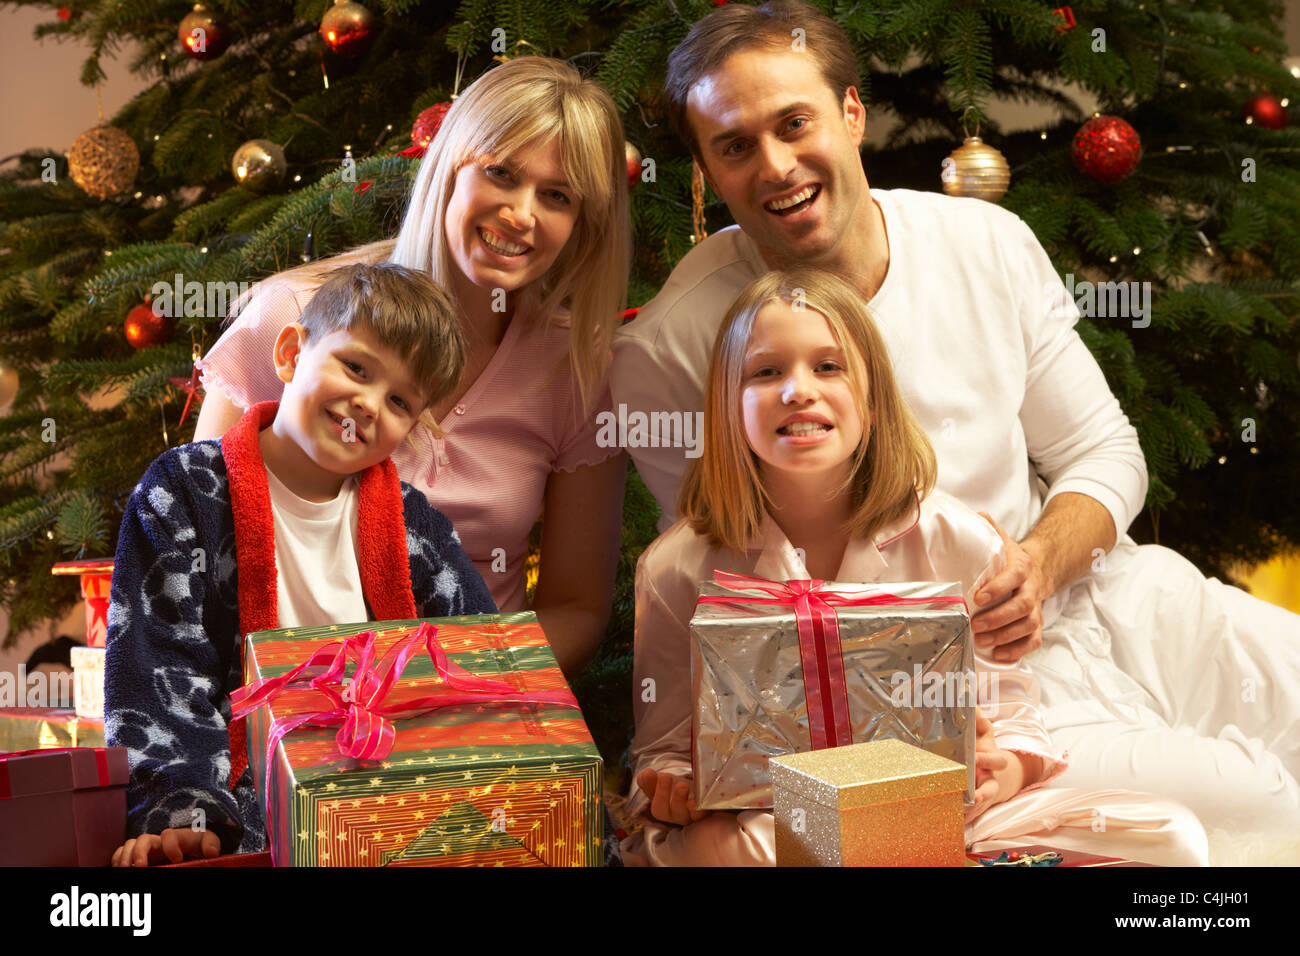 family tree stockfotos family tree bilder alamy. Black Bedroom Furniture Sets. Home Design Ideas